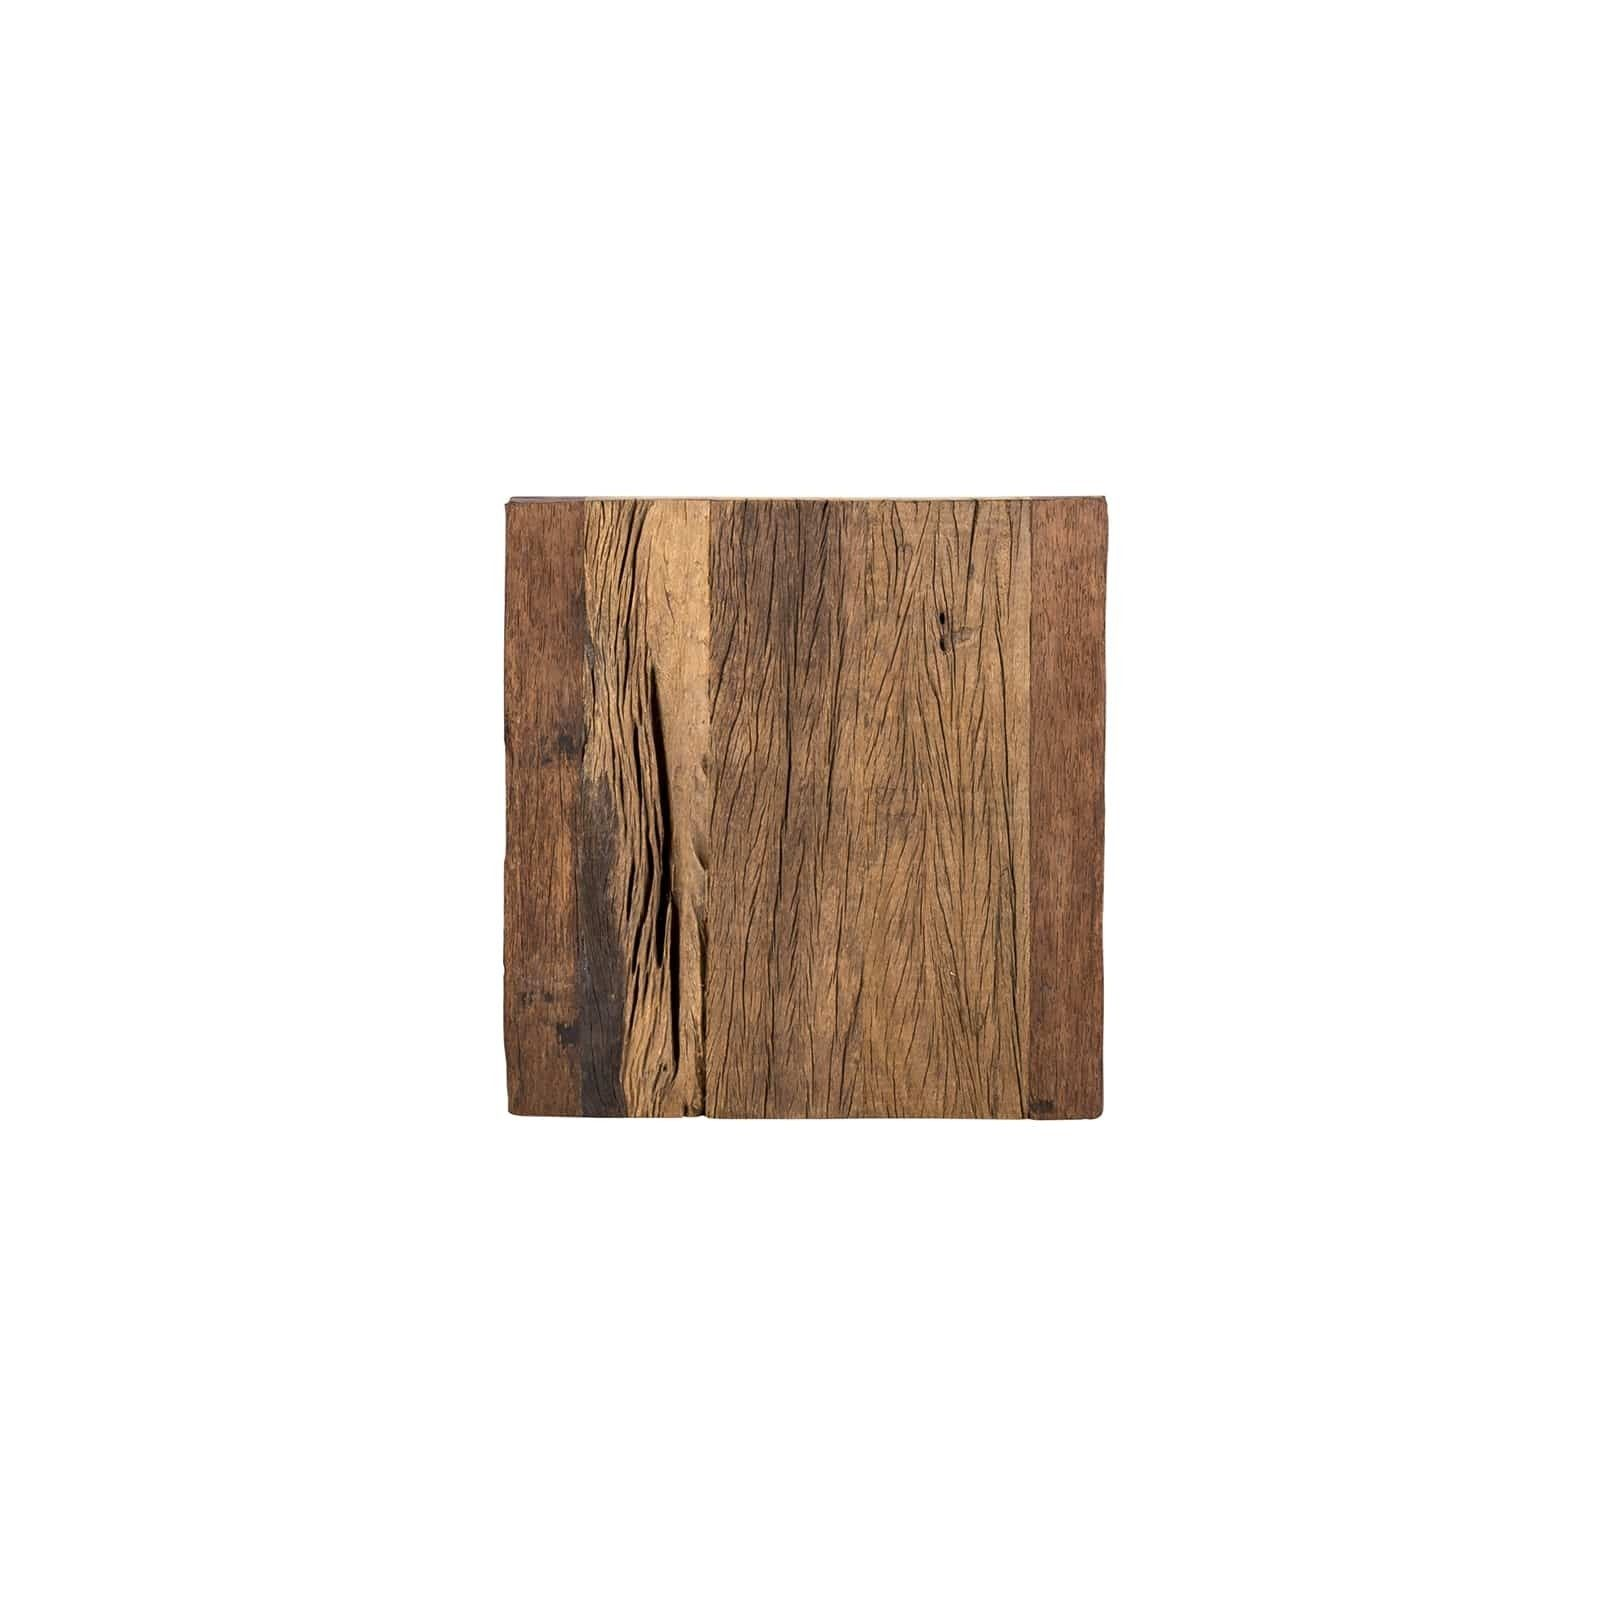 Table d'angle Kensington 45x45 Meuble Déco Tendance - 209